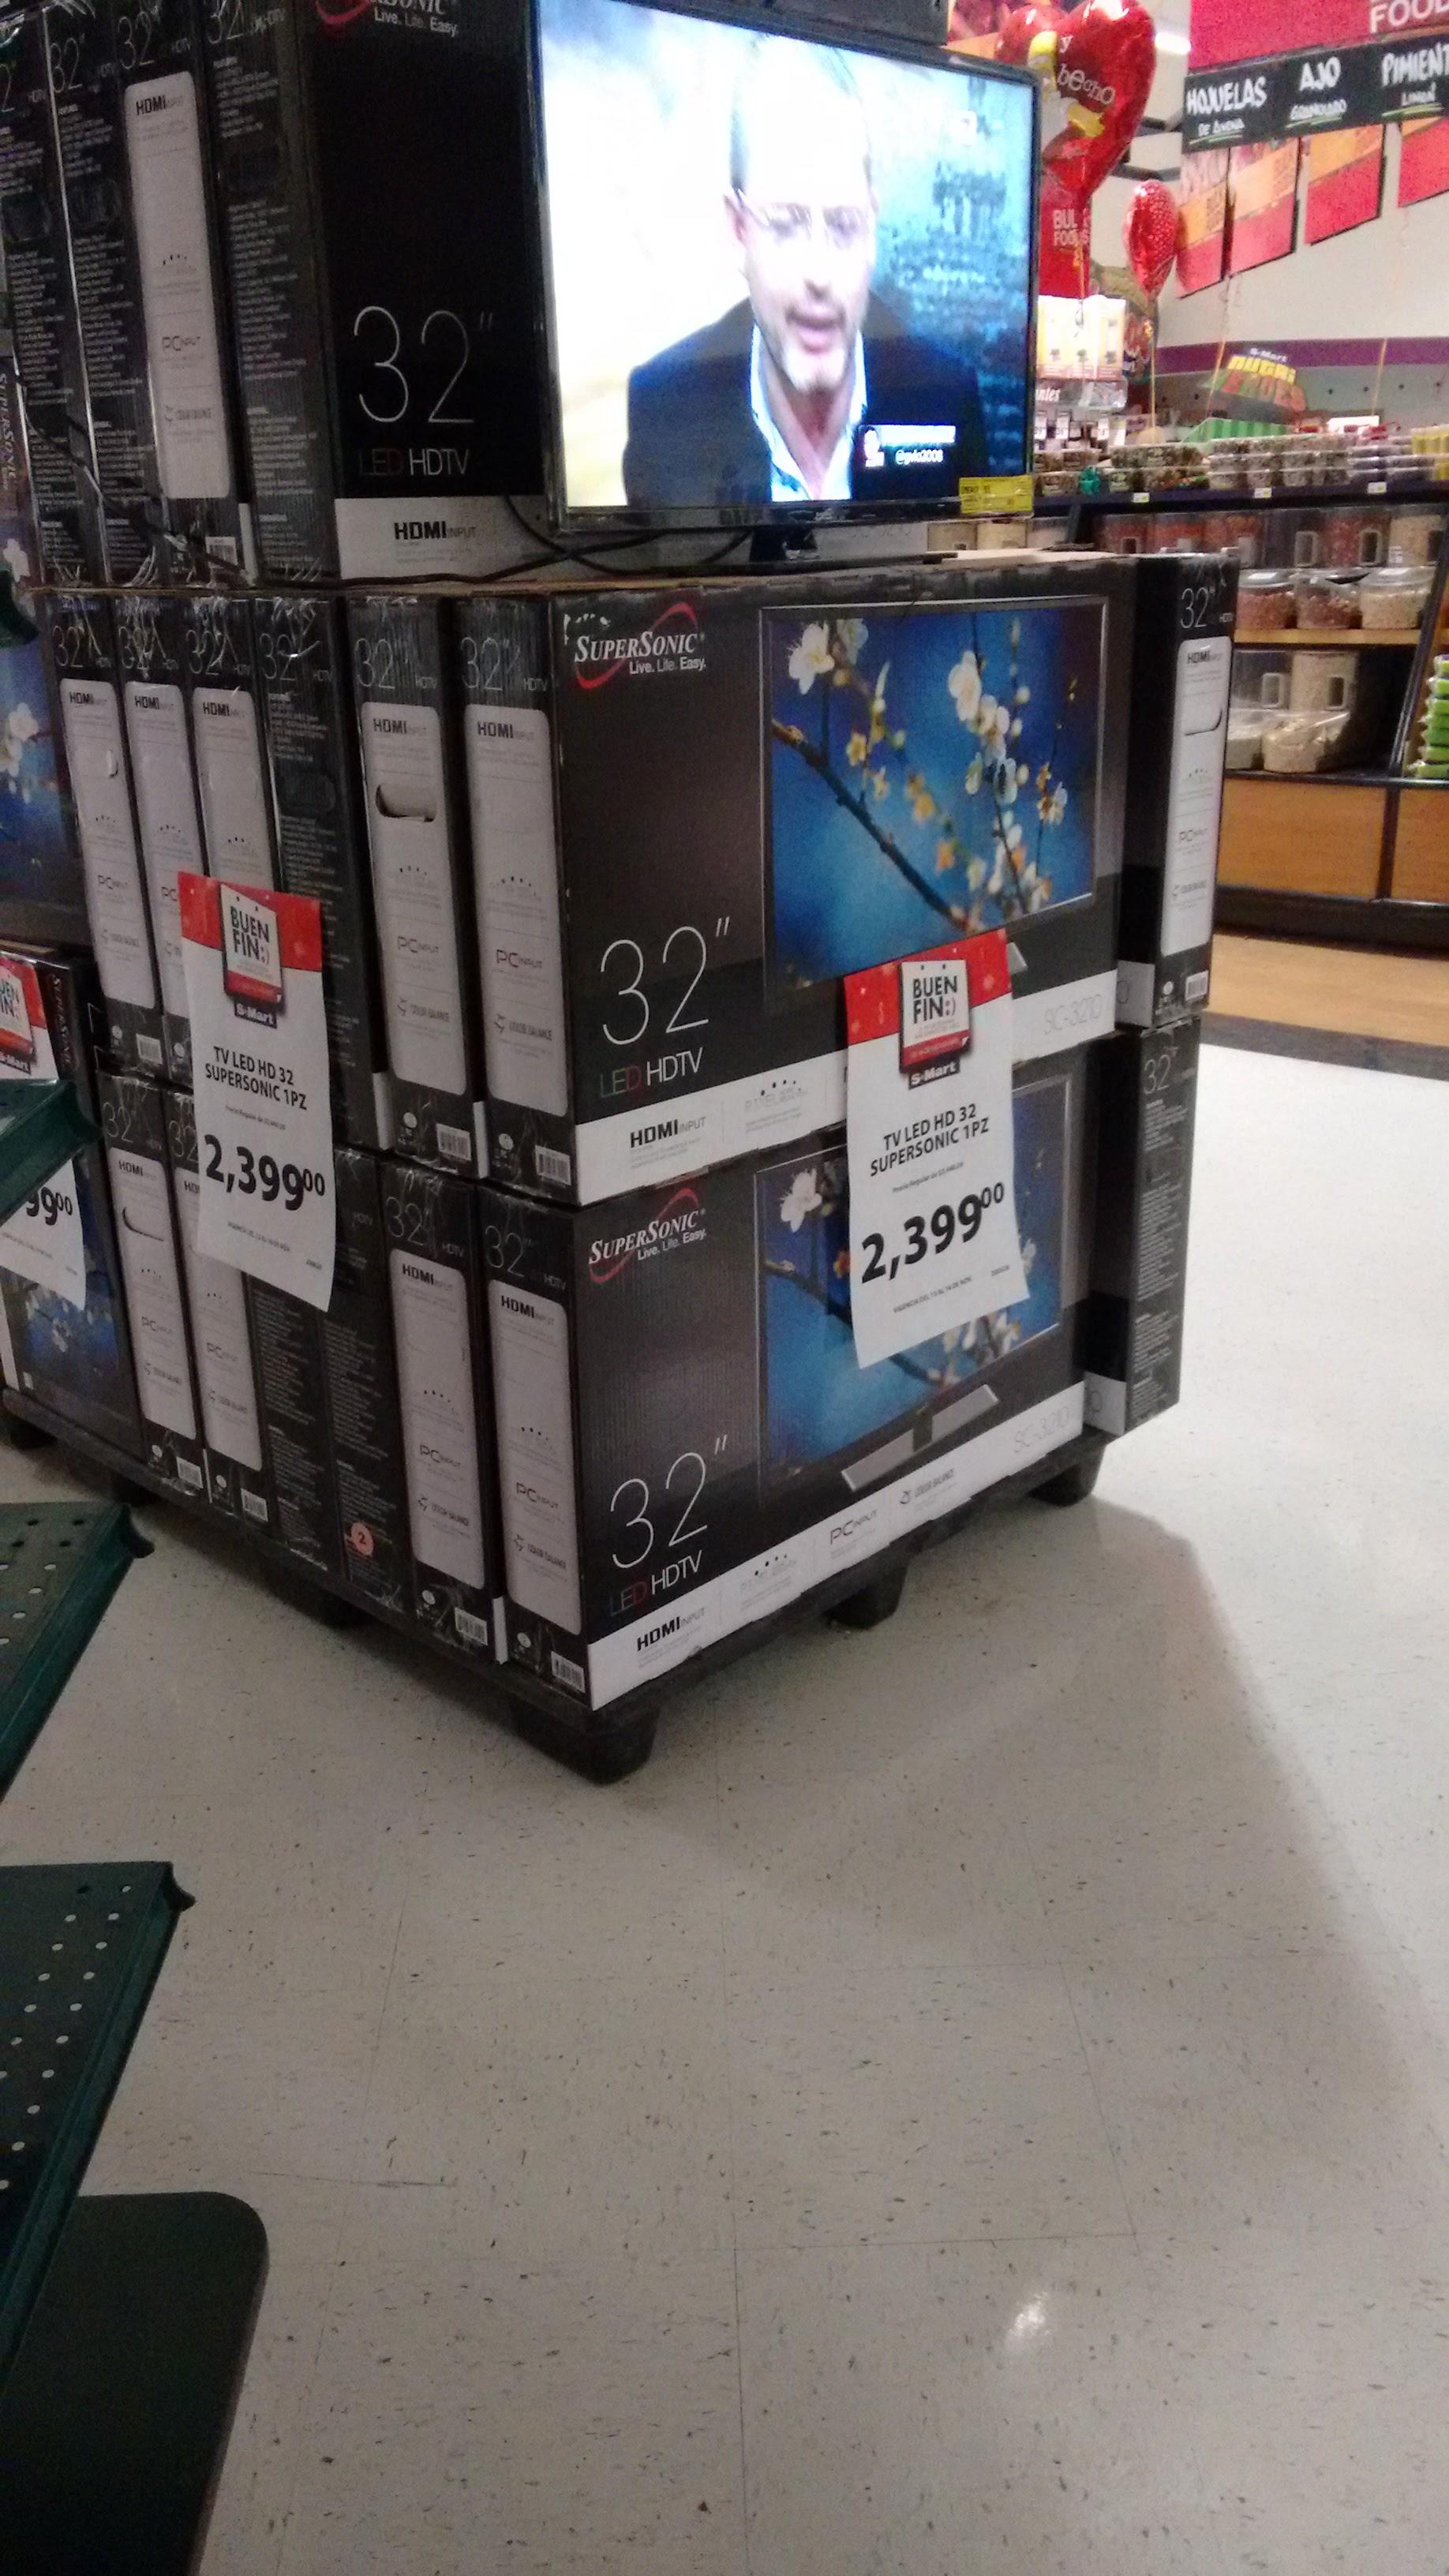 Tienda Smart: Television HD LED 32 Pulgadas